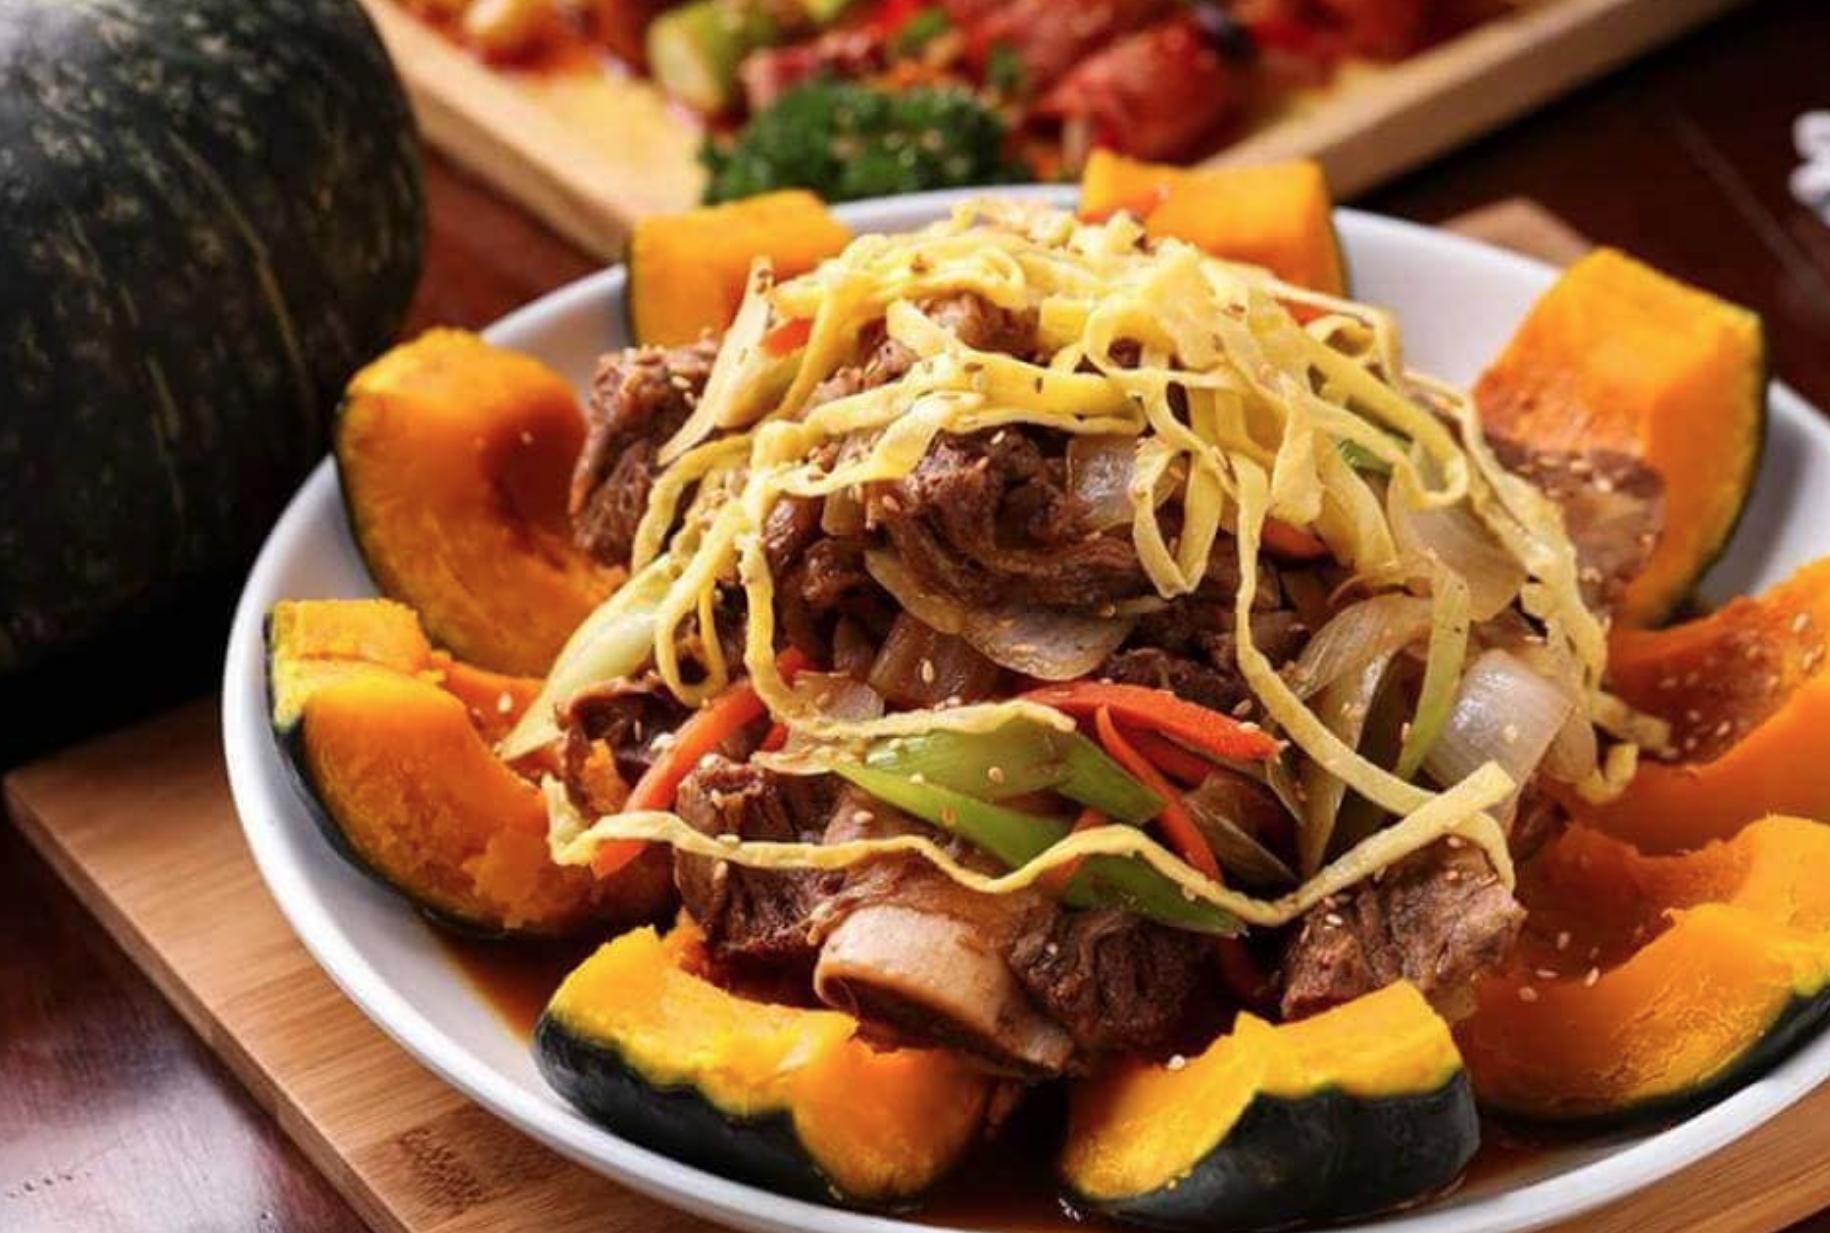 Kims Korea Cafe Macau Pumpkin Dish.jpg